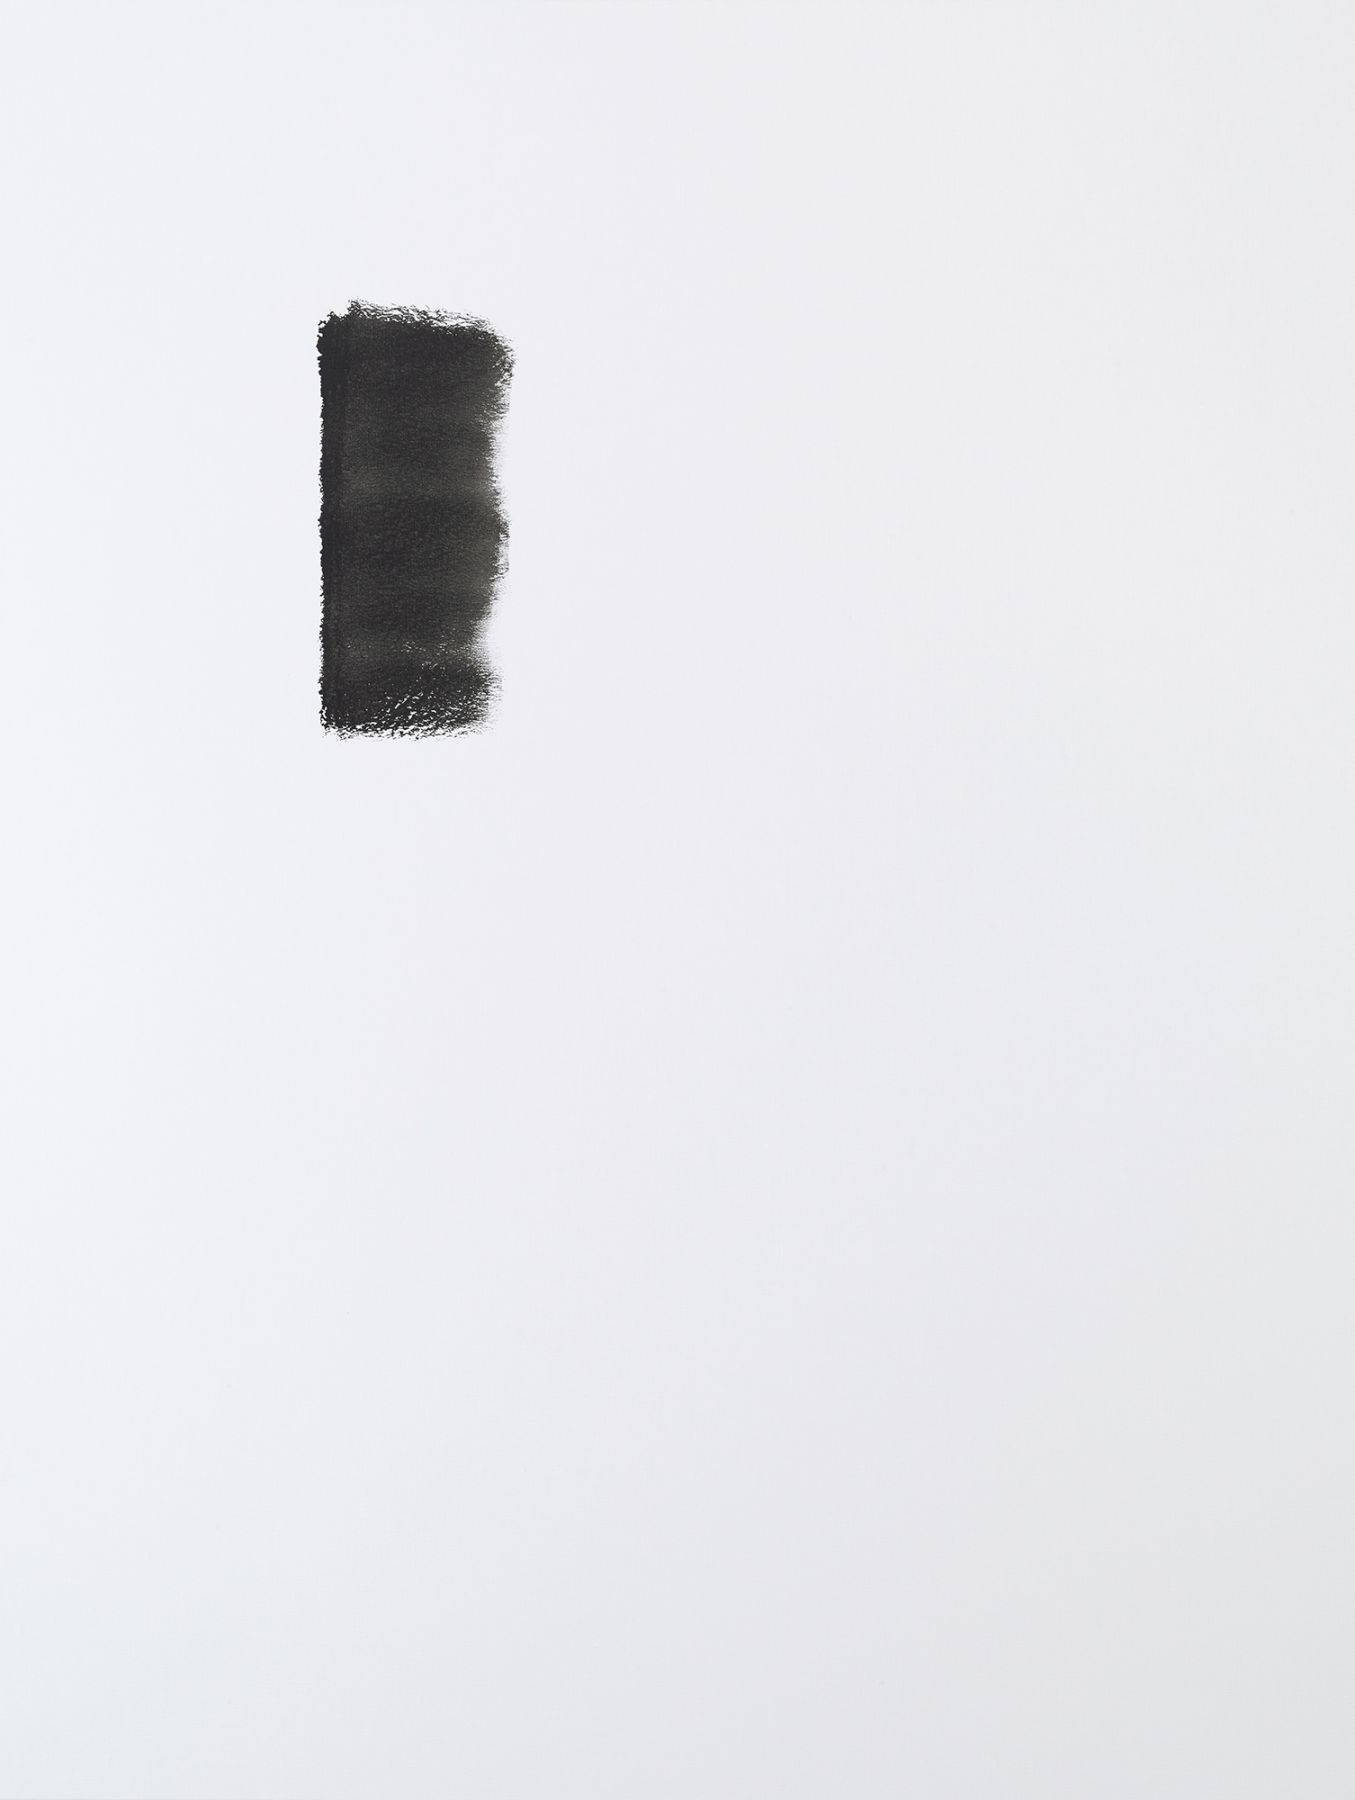 Michael Krebber MK.288, 2015 Acrylic on canvas 78 3/4 x 59 1/8 inches (200 x 150.2 cm)